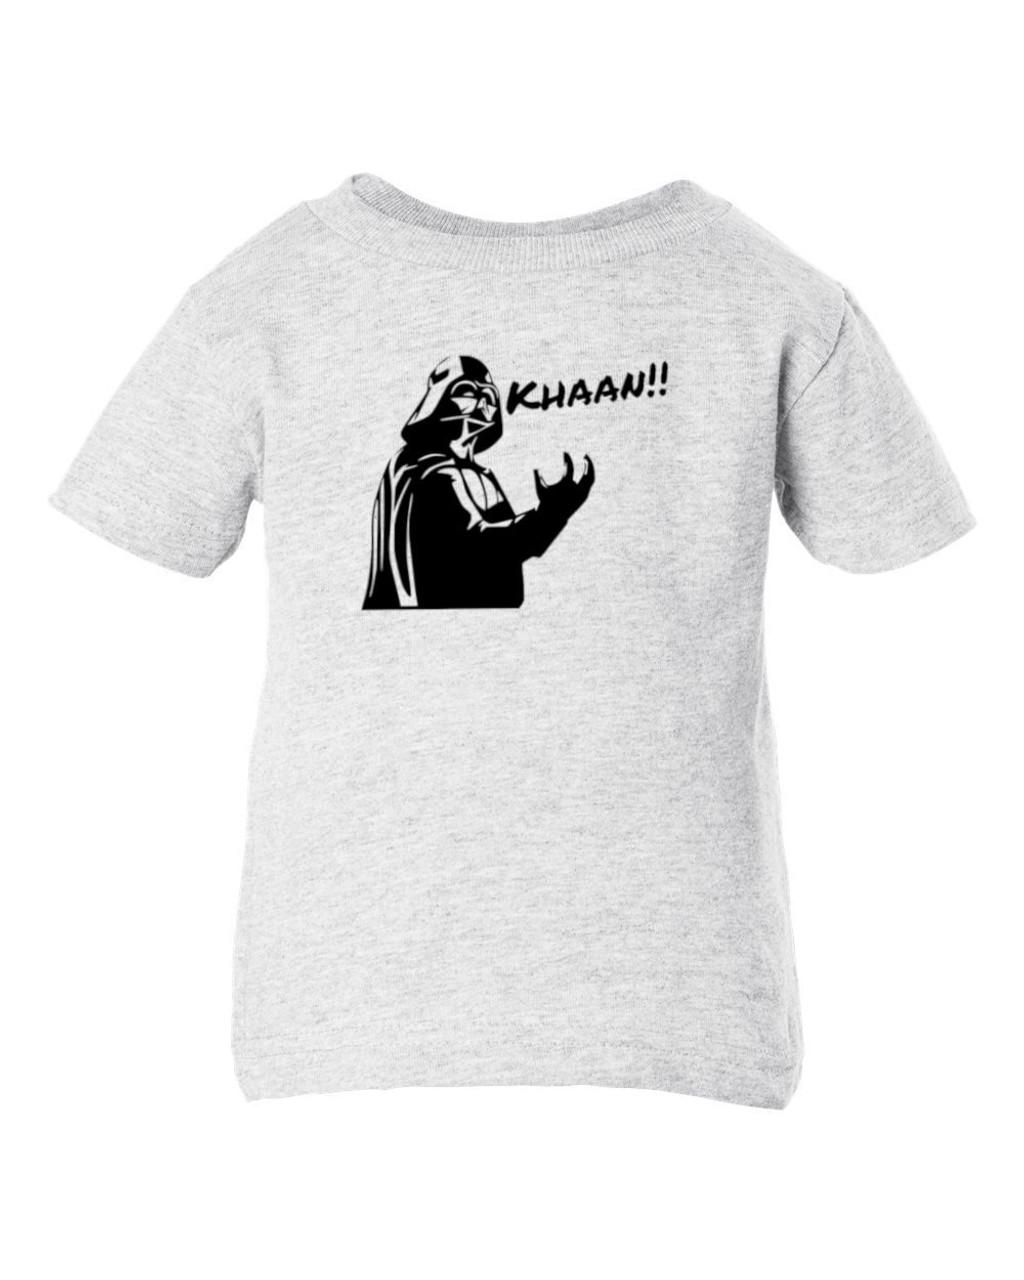 Star Force Trek Wars Vader Kirk Parody Sci-Fi Funny Baby Toddler Child Ash T-Shirt